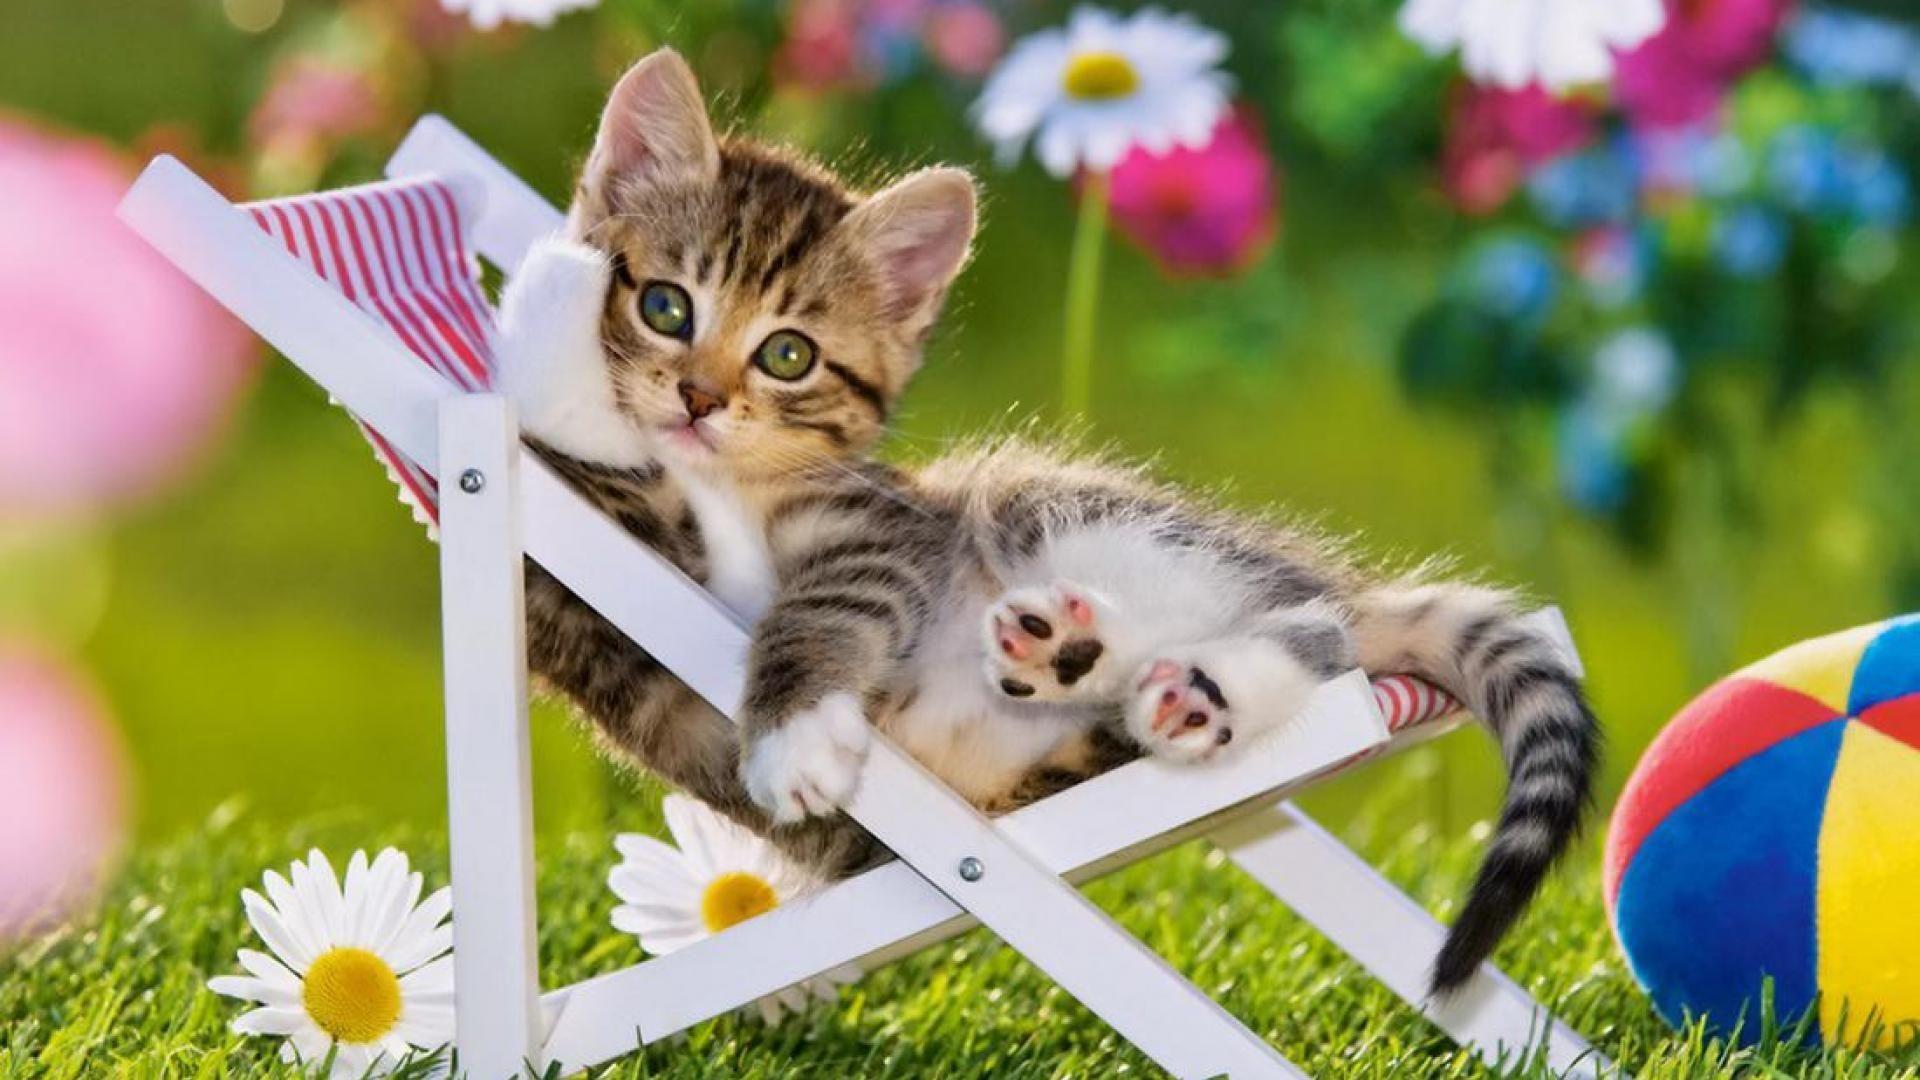 Summer Cat Wallpapers Top Free Summer Cat Backgrounds Wallpaperaccess